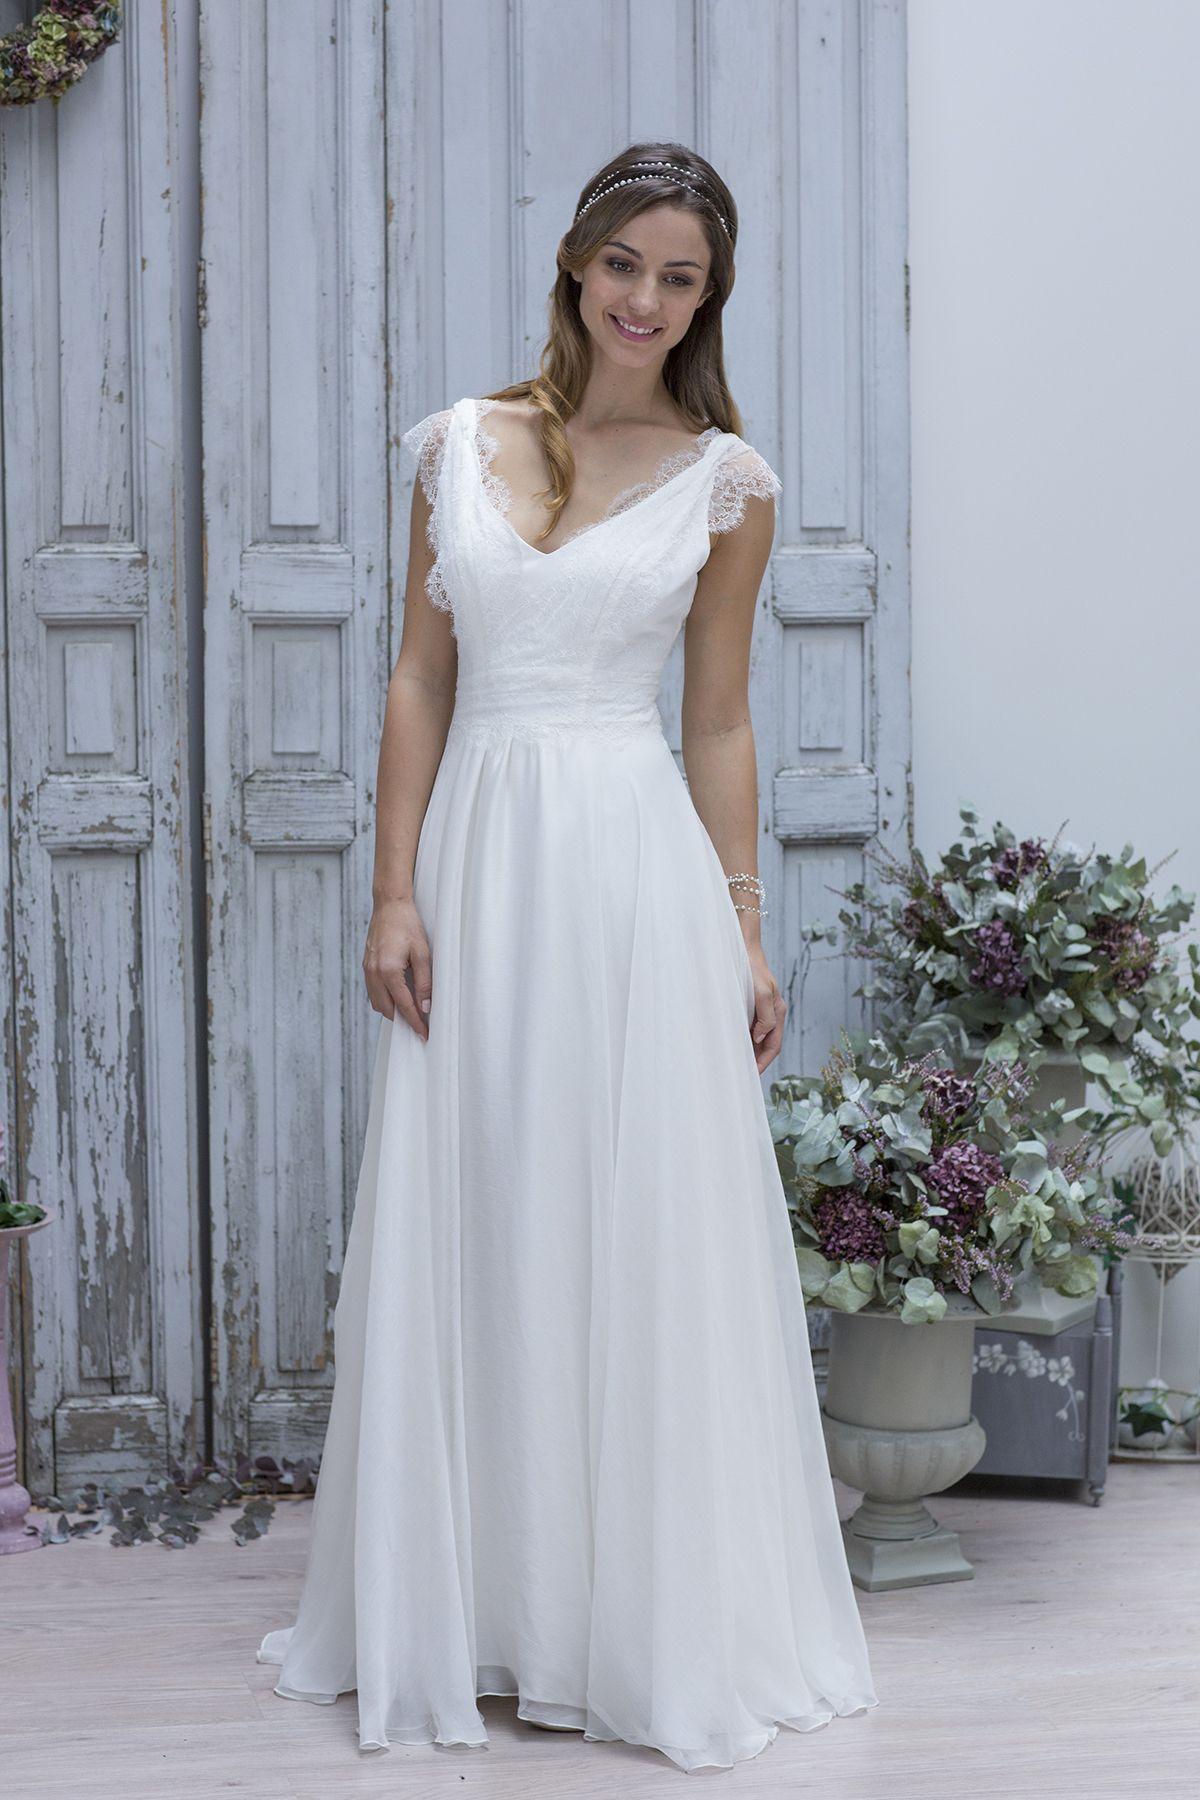 Pin by Darla Harris on weddings | Pinterest | Wedding dress, Wedding ...